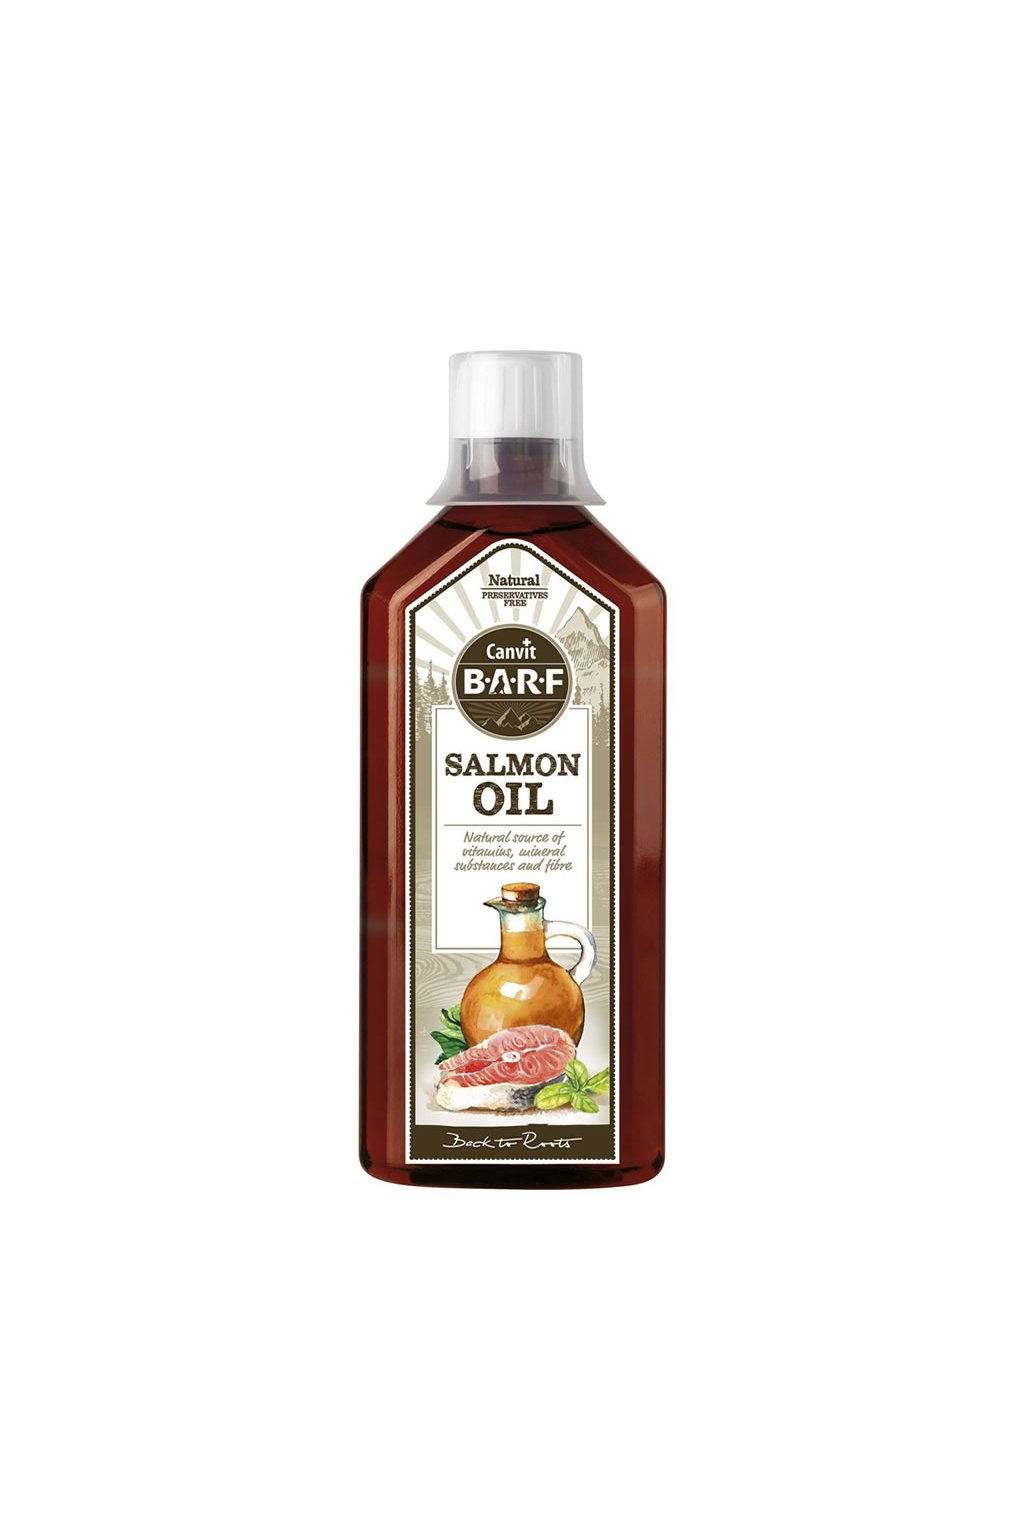 CB Salmon oil 500ml 3D